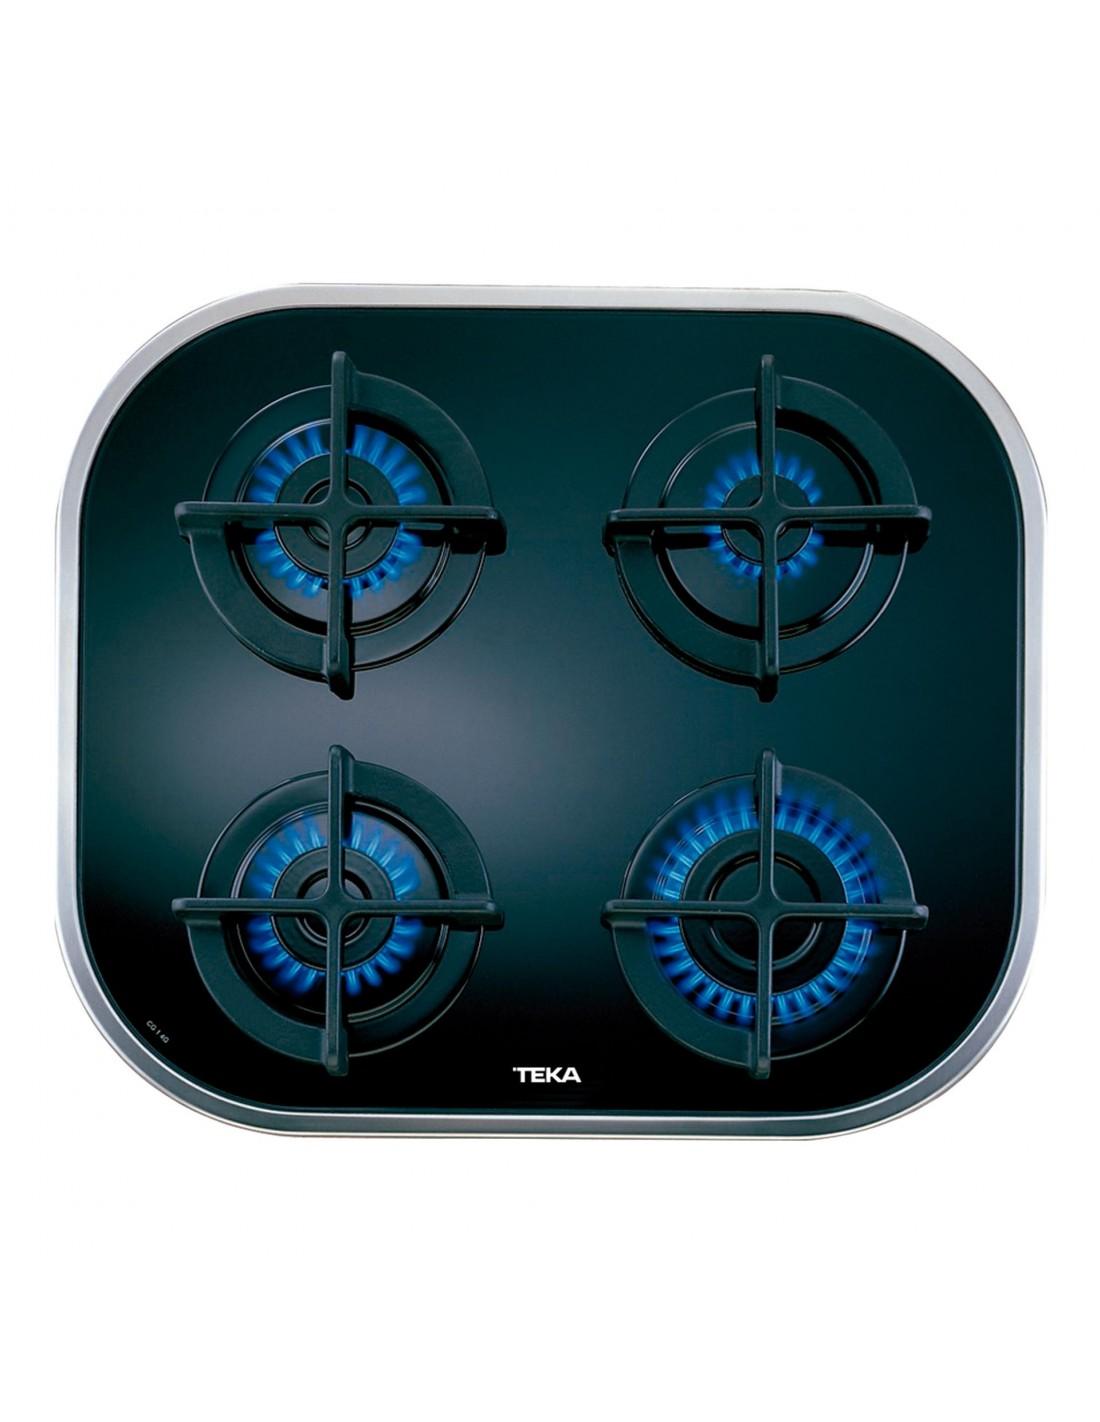 Secadora Aeg T8dbg842 Absolutecare Bomba De Calor Prosense 8kg A++ Inverter Filtro Okoflow Woolmark Blue Puerta Silver 916097